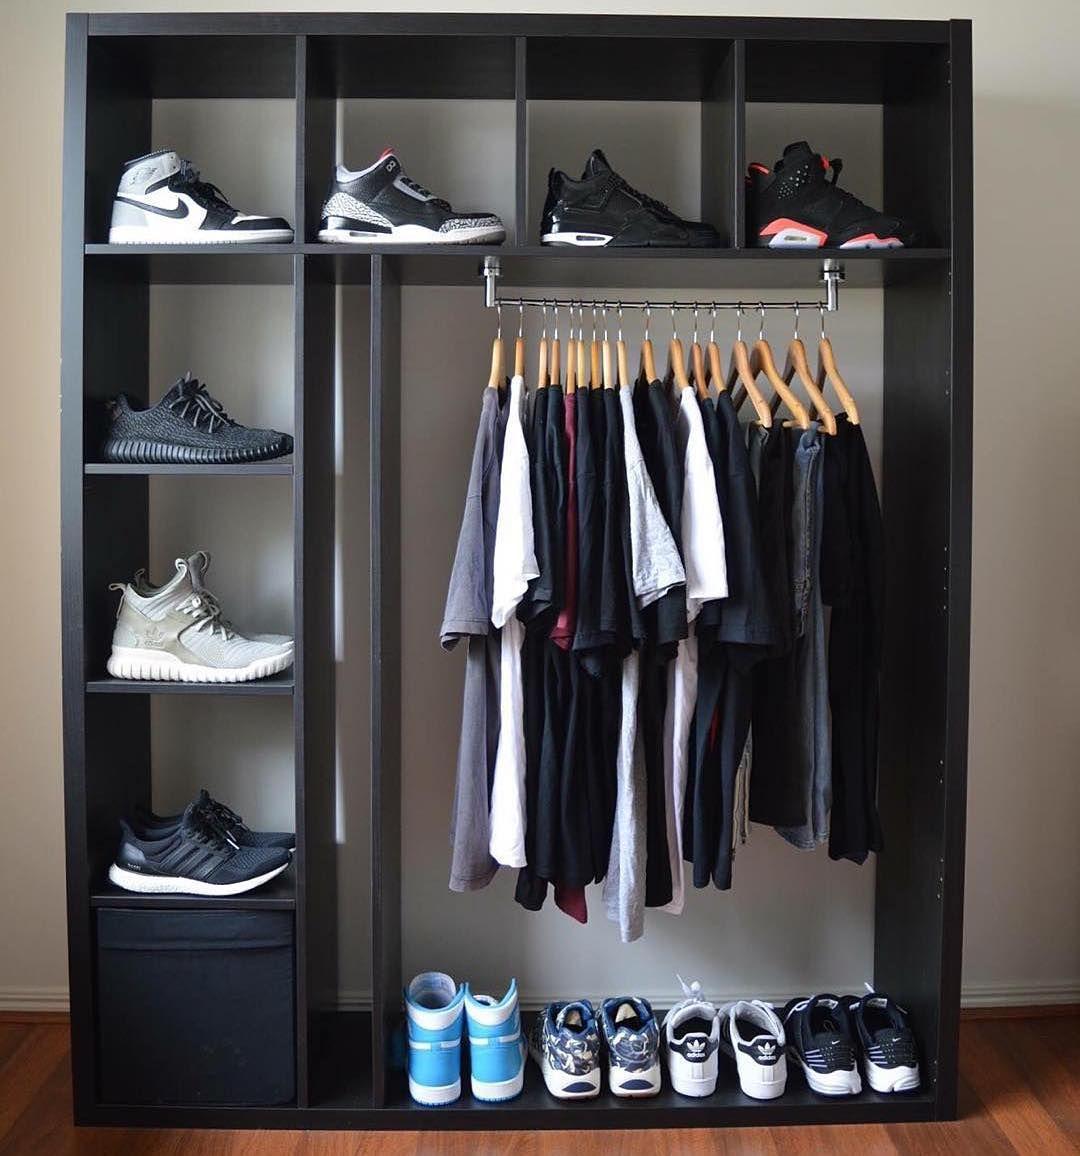 4 Sneaker/clothing setup ideas  sneakerhead room, hypebeast room